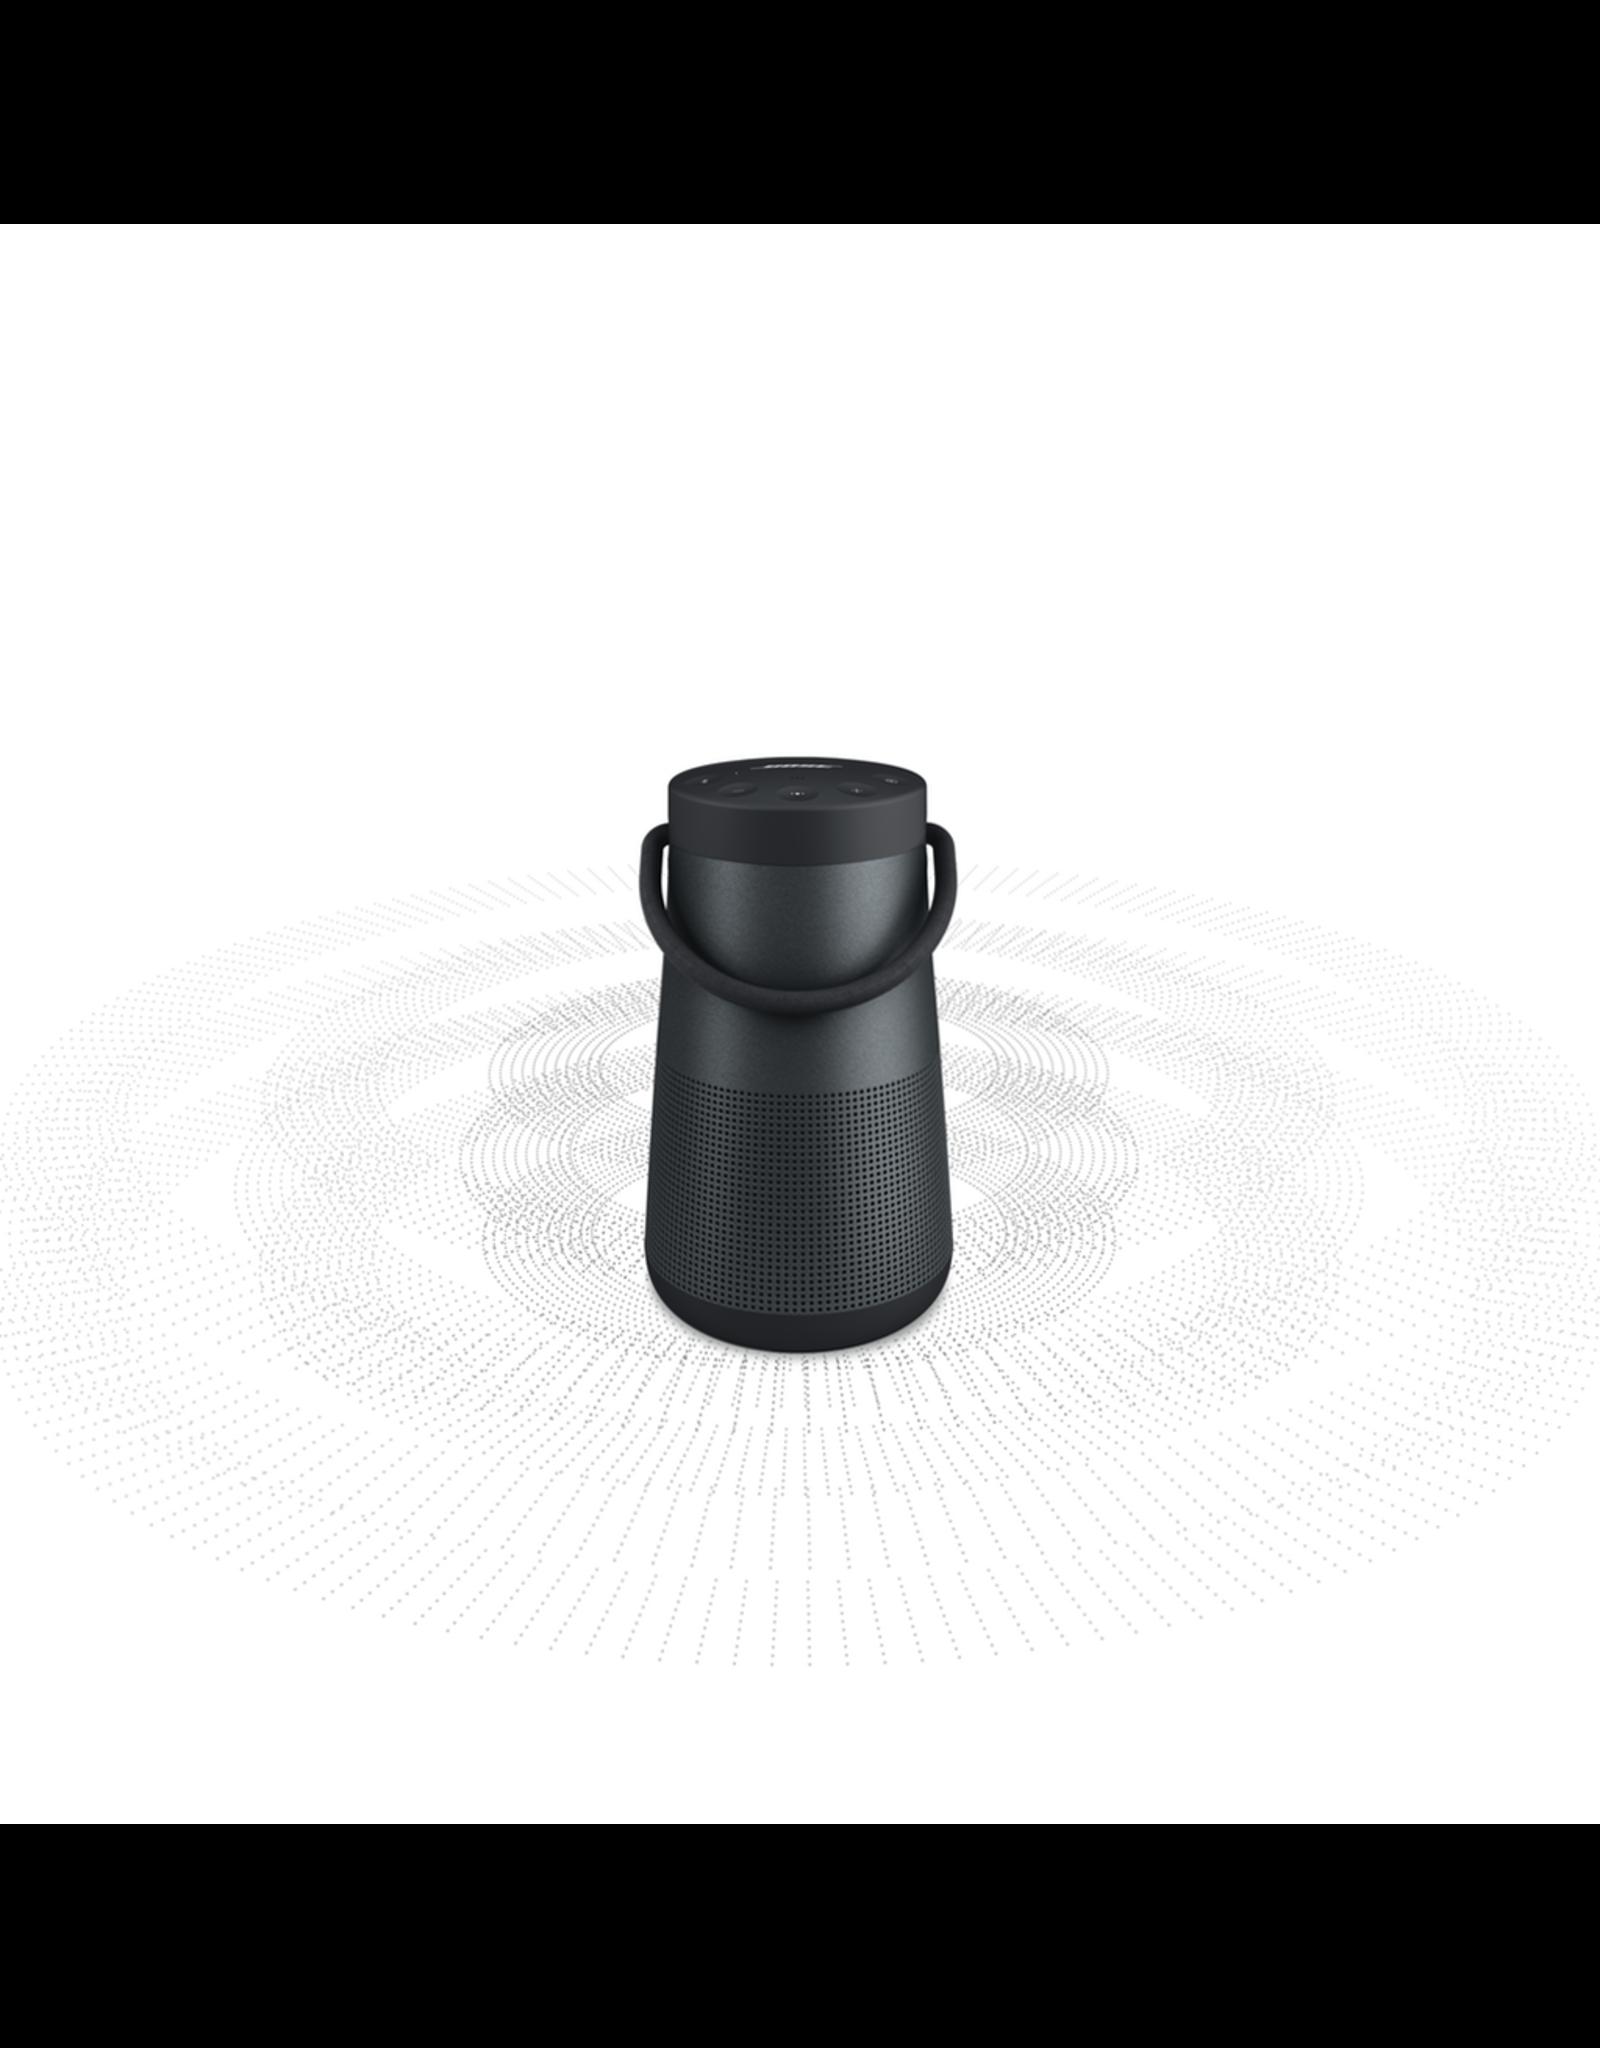 BOSE BOSE SoundLink Revolve PLUS Bluetooth Speaker